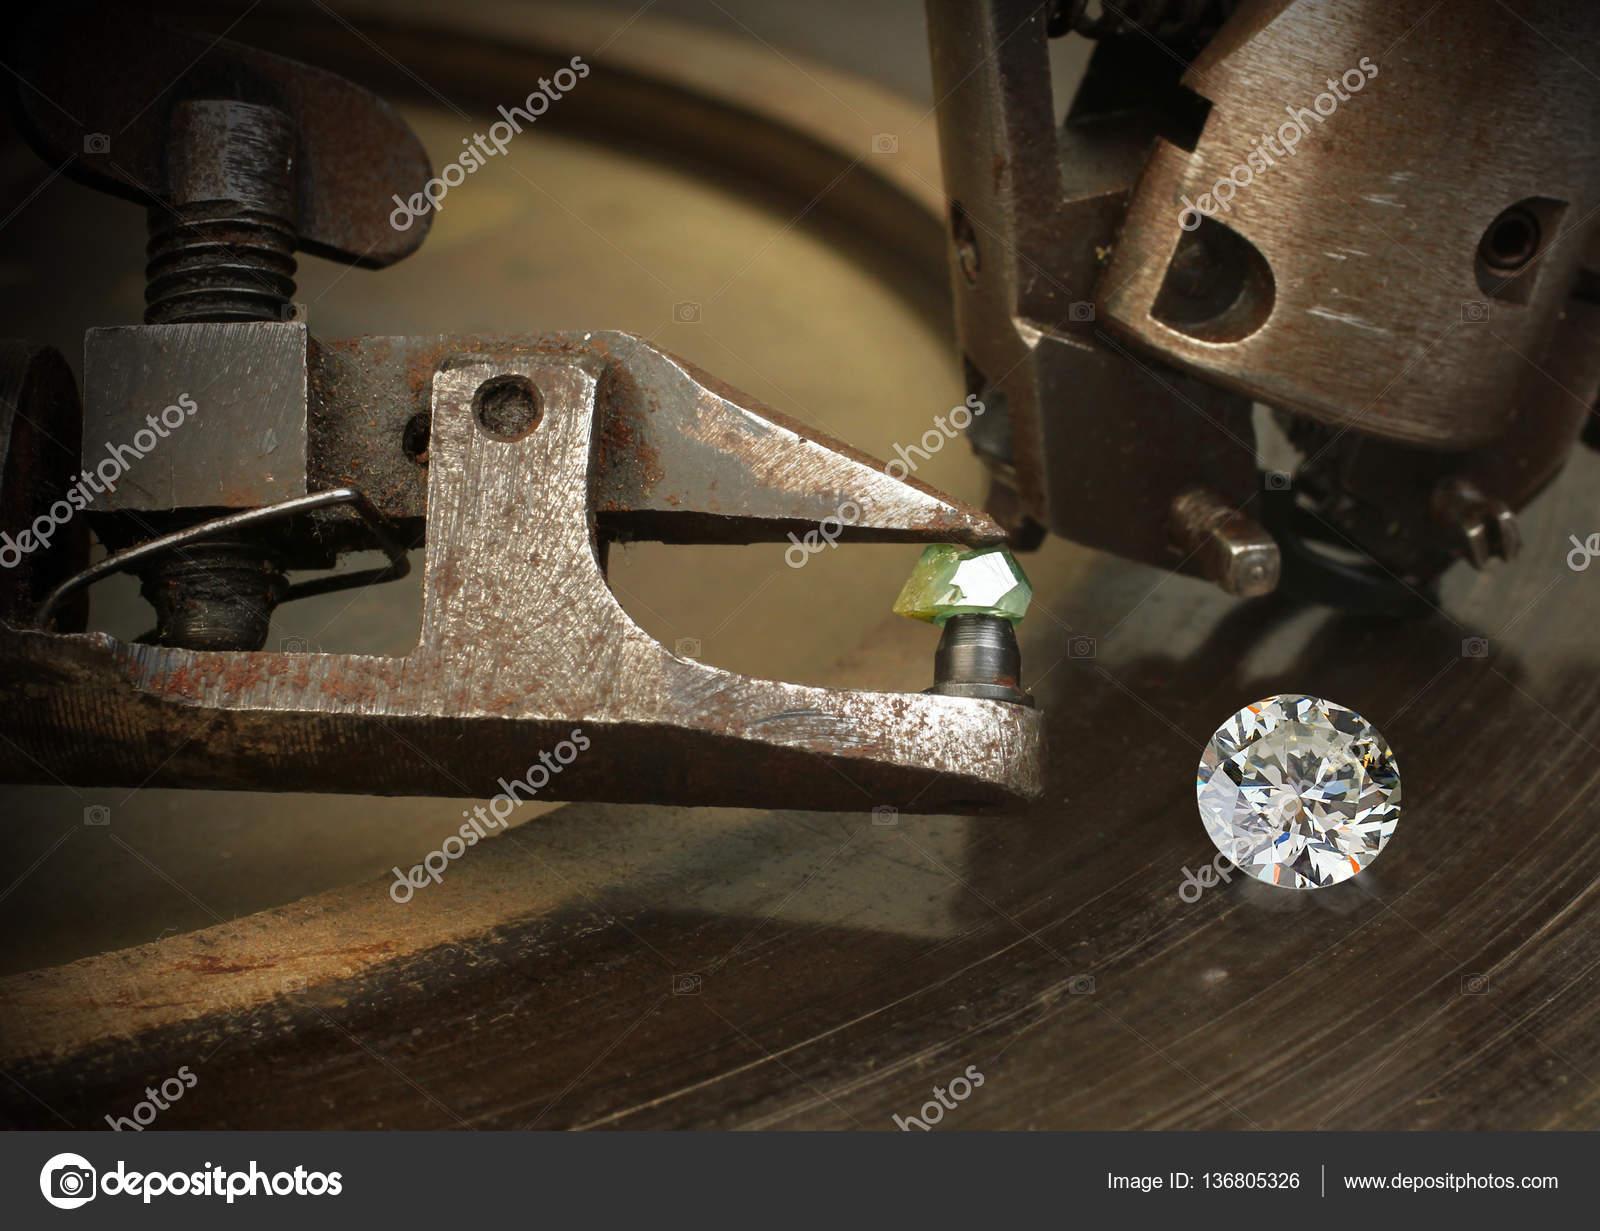 Faceting diamond, big gem with jewelery cutting equipment